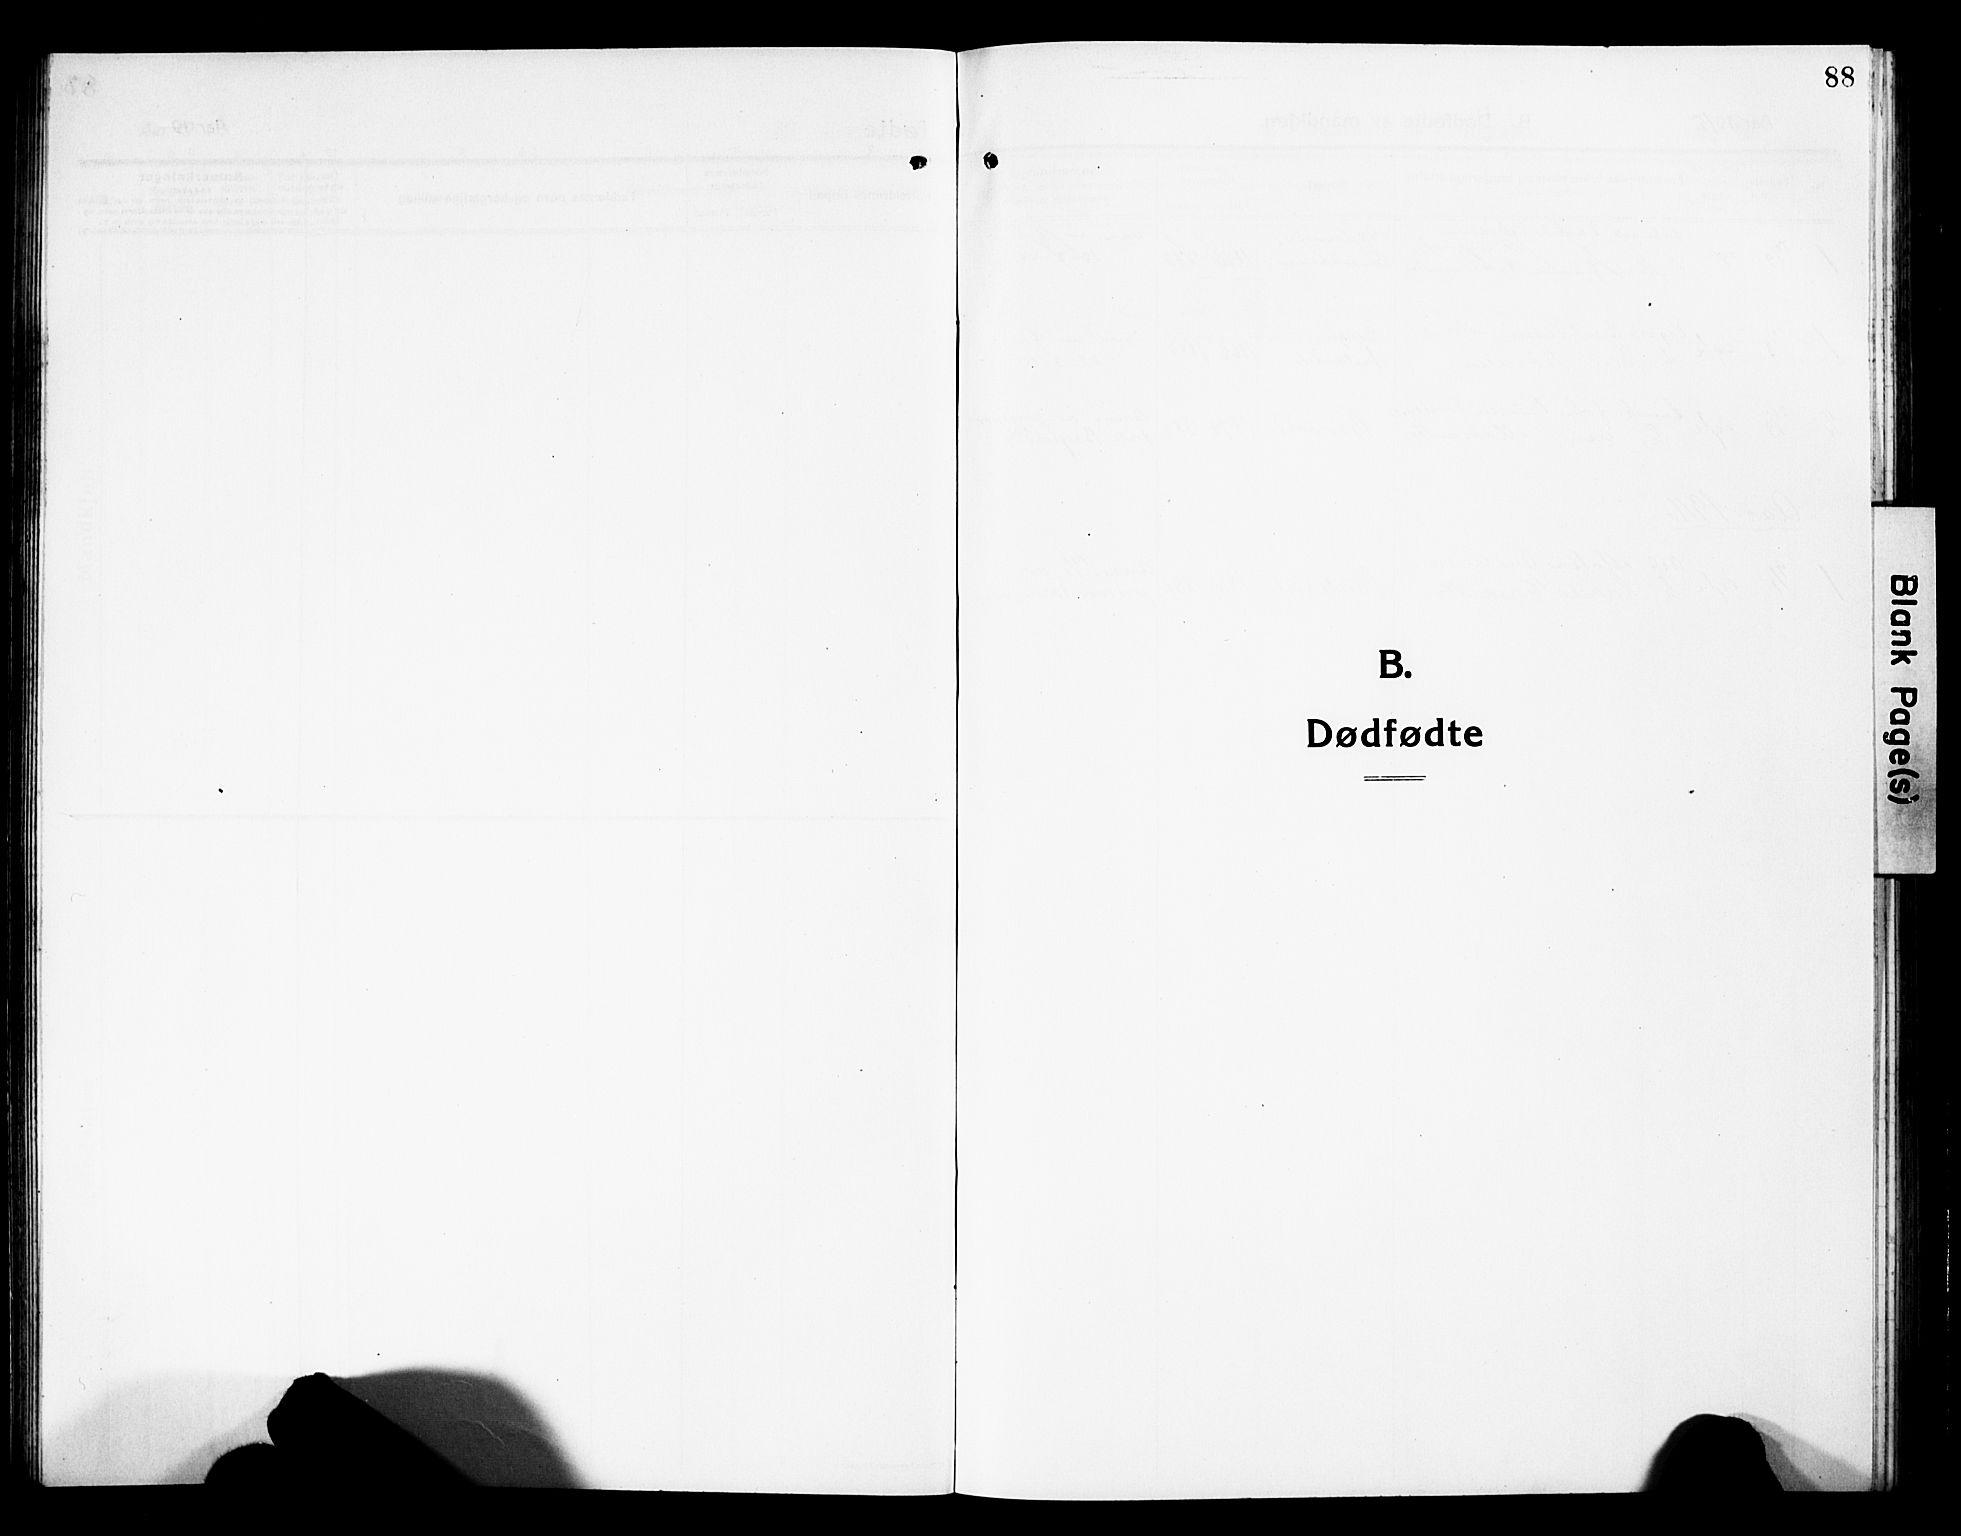 SAH, Vardal prestekontor, H/Ha/Hab/L0015: Klokkerbok nr. 15, 1914-1931, s. 88